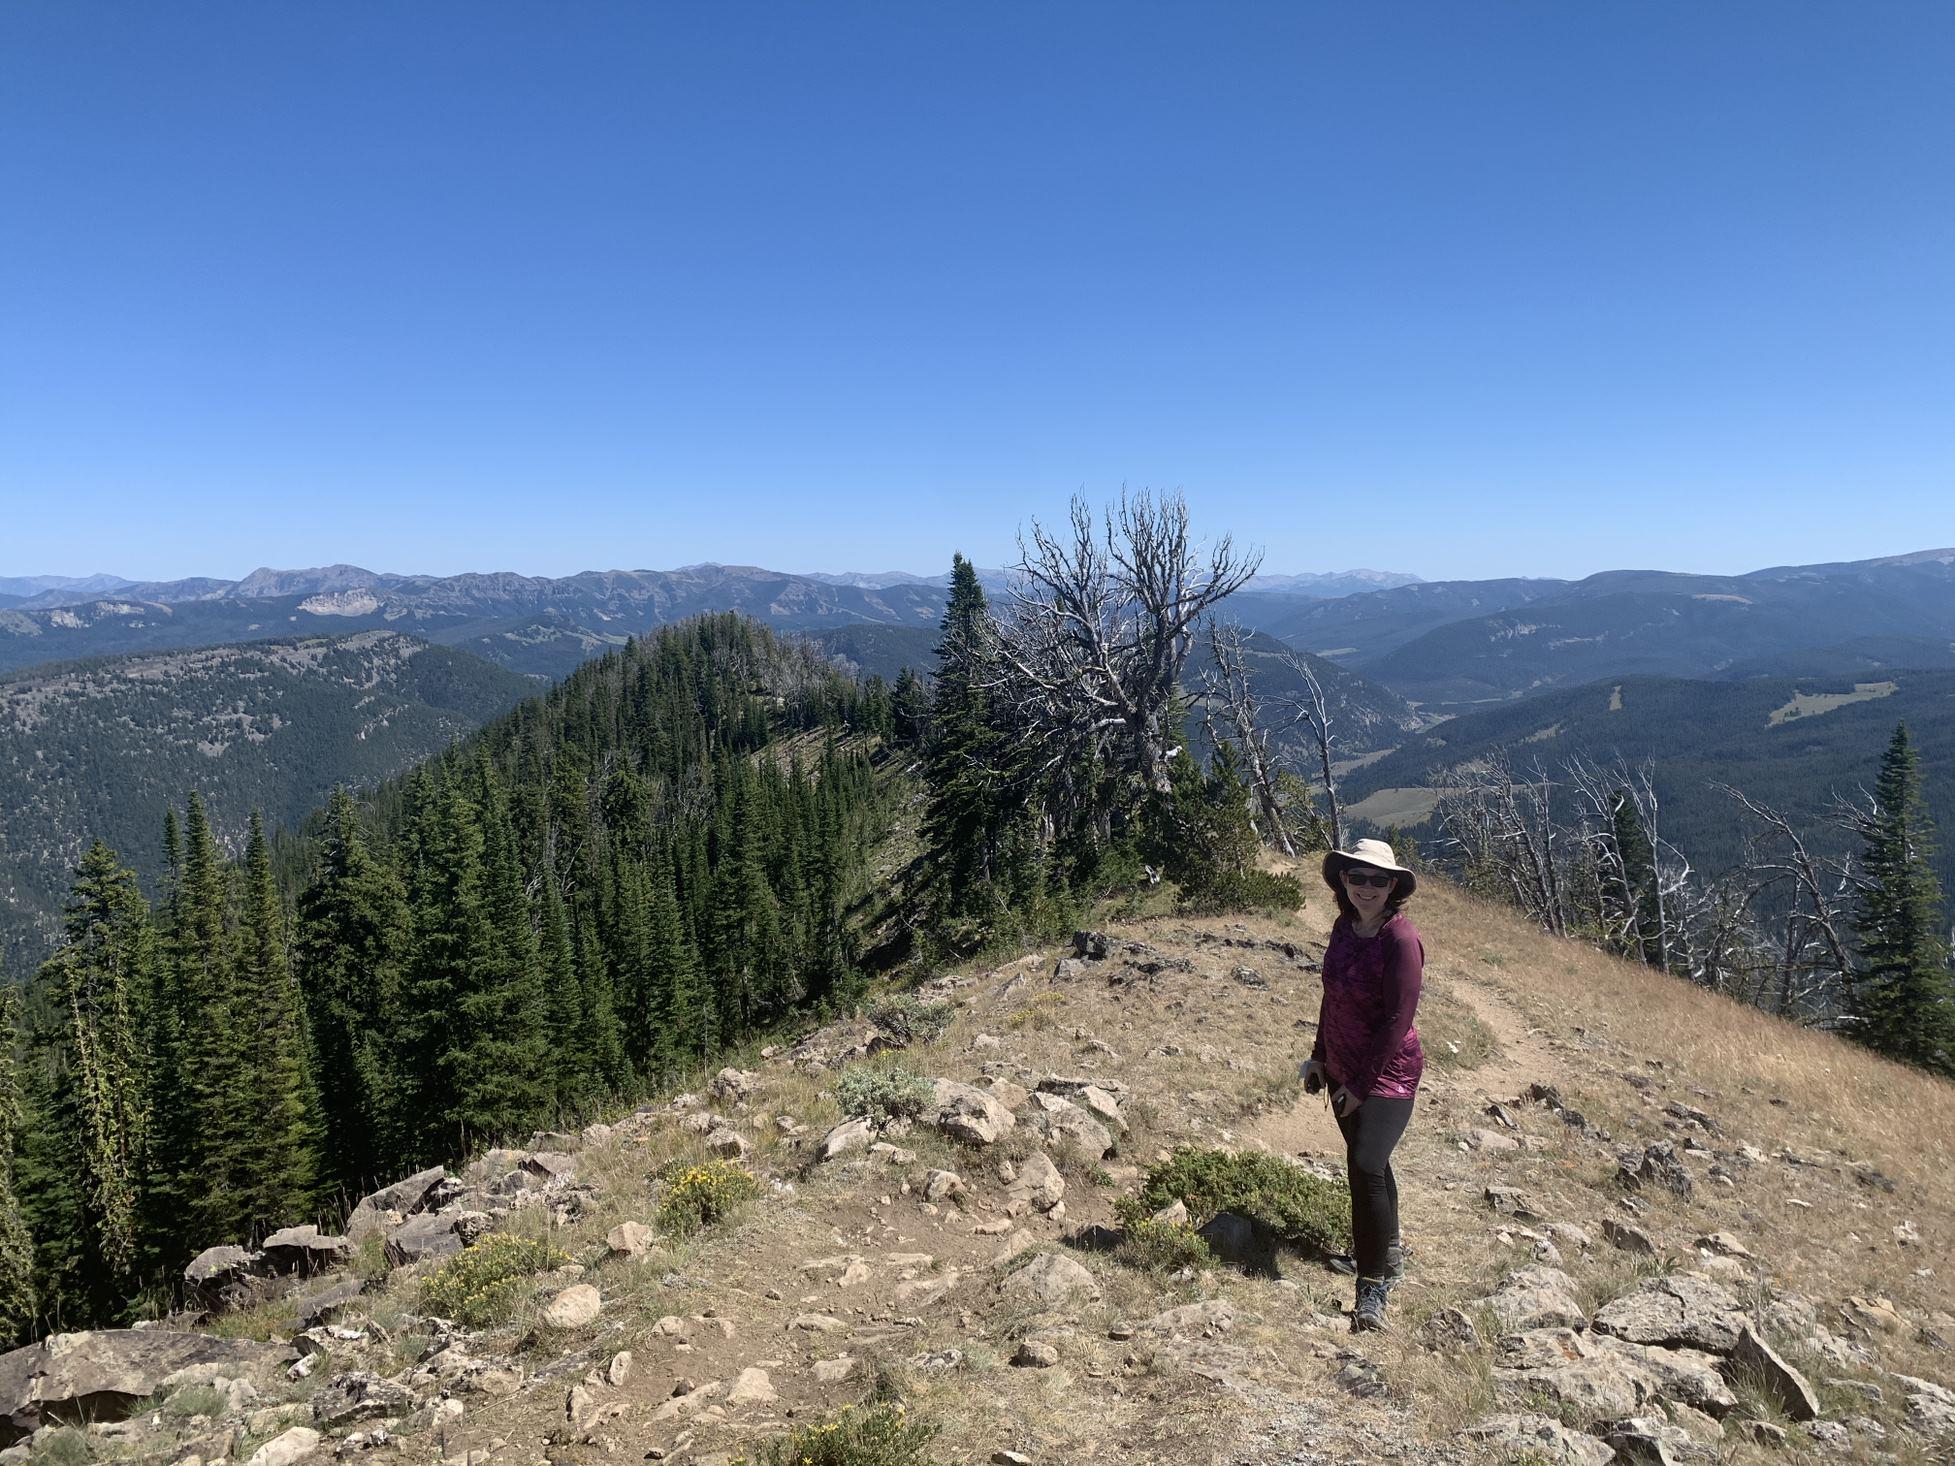 Mount Cinnamon